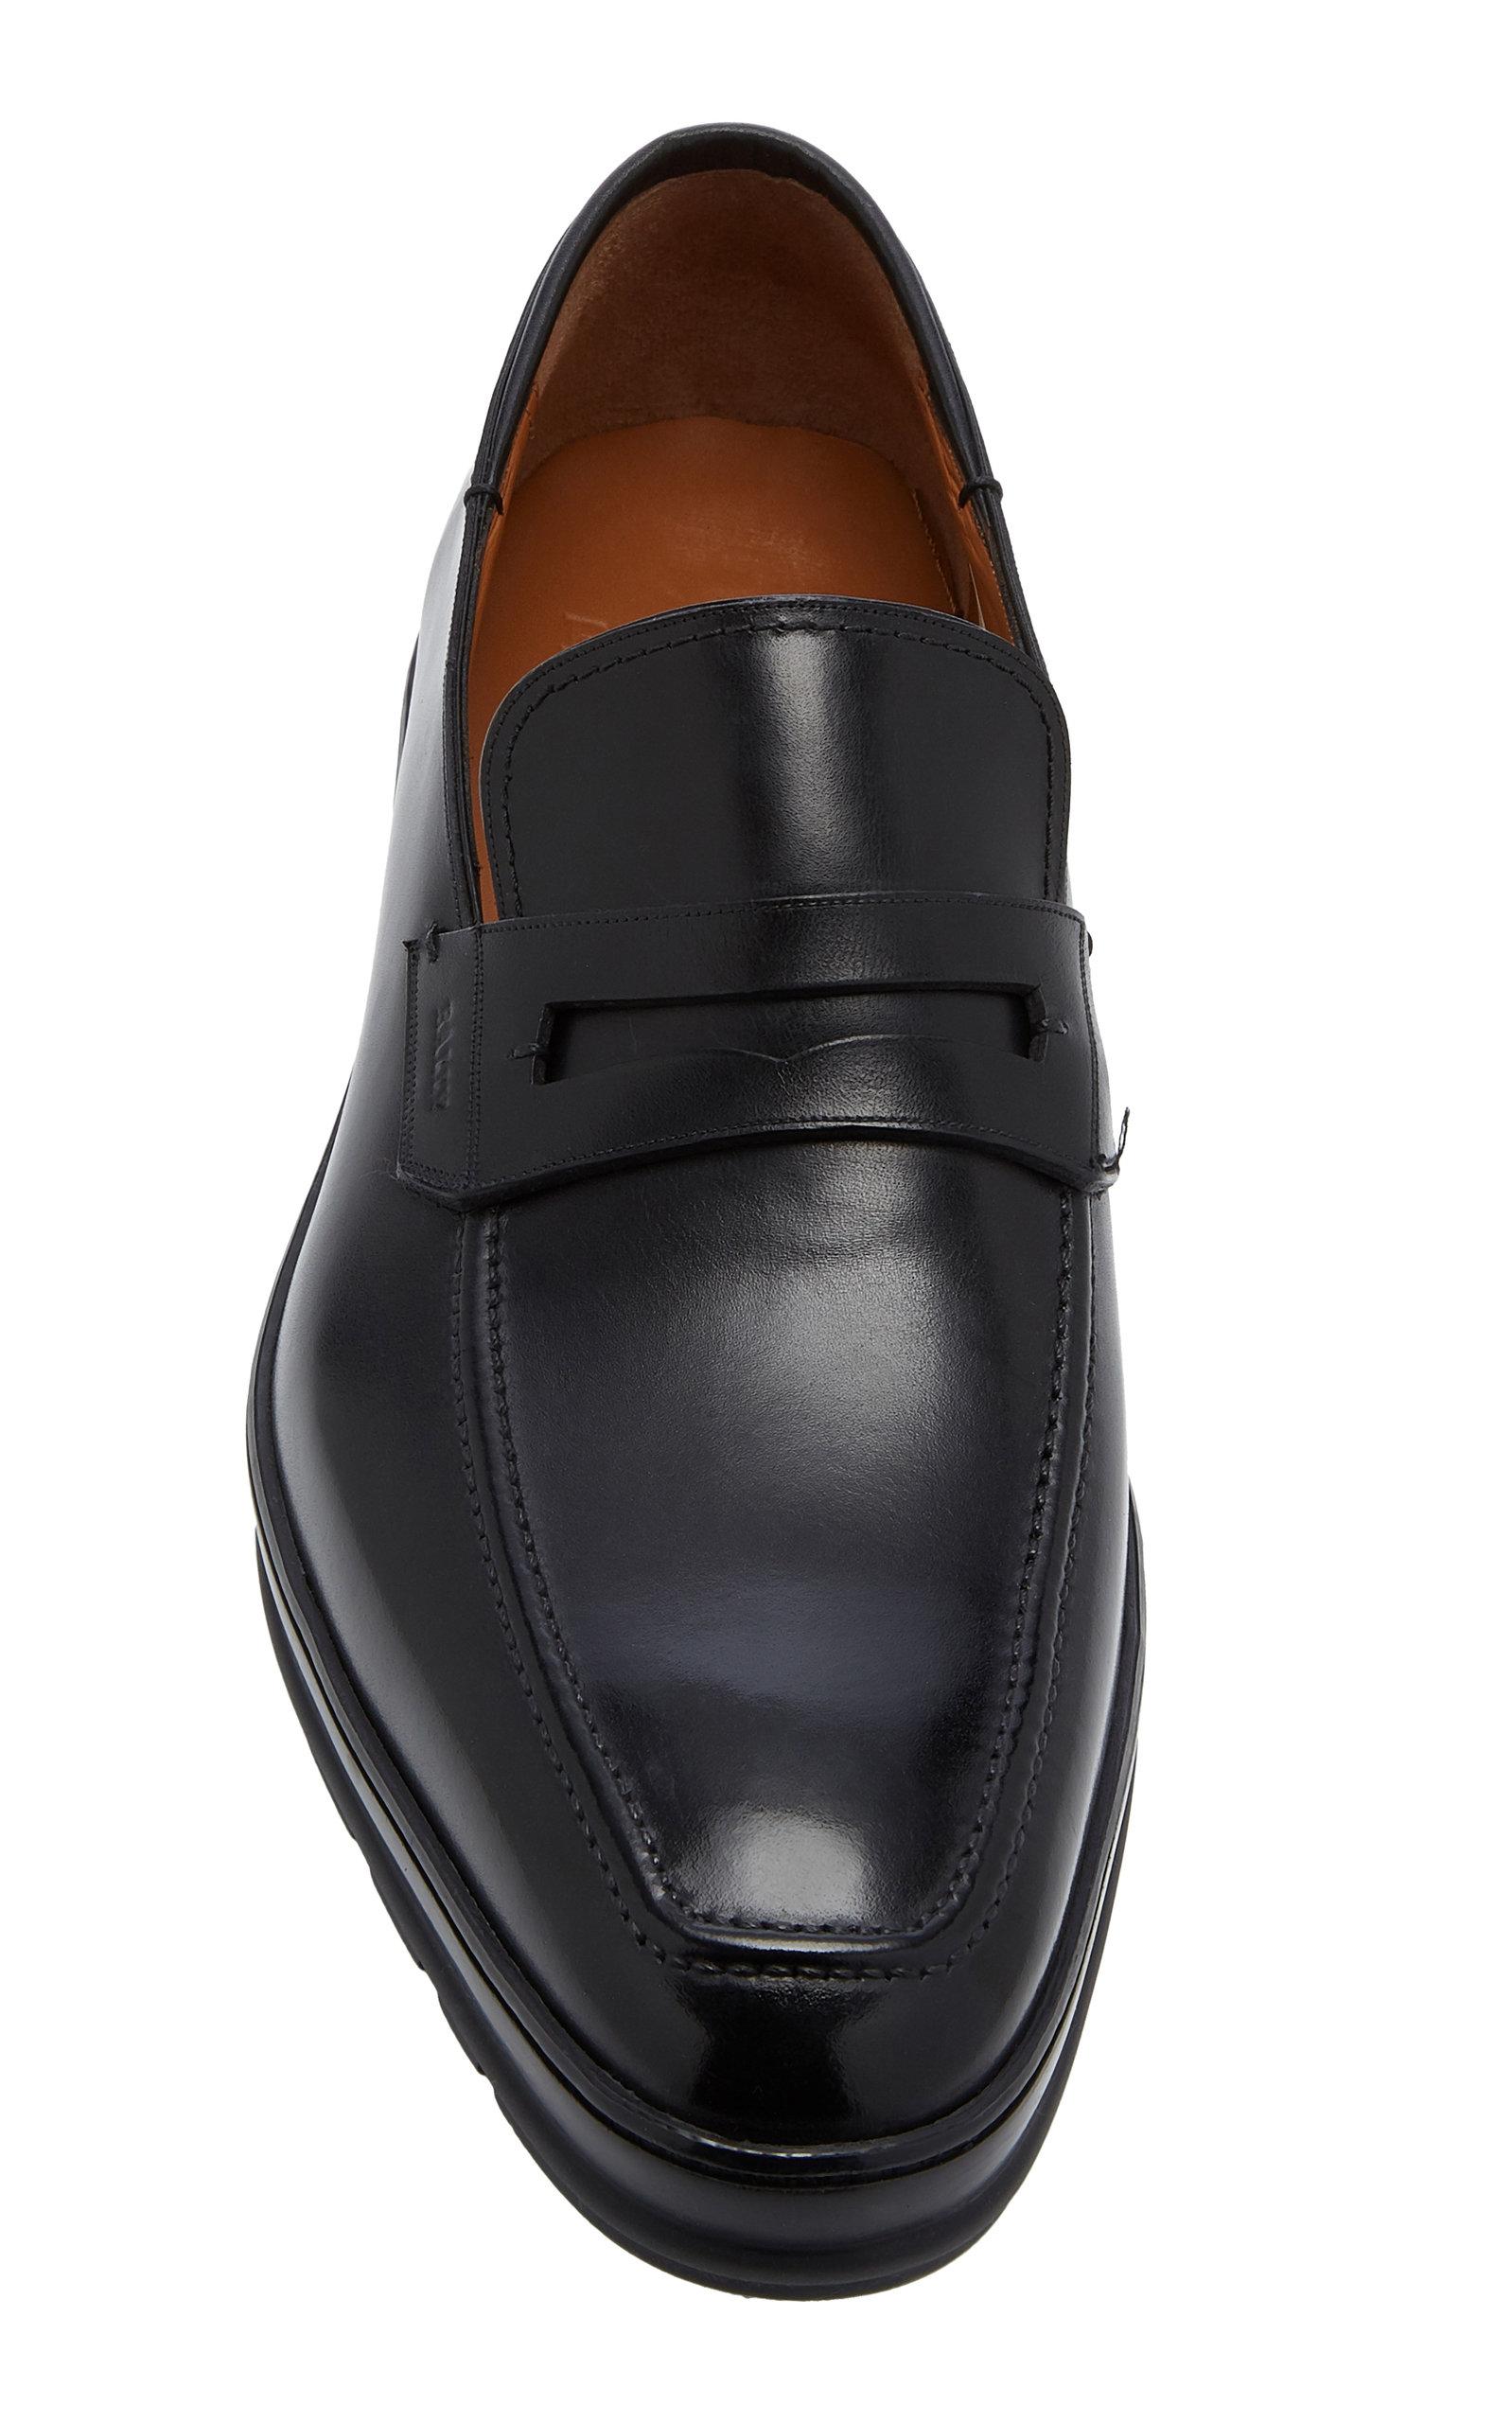 39437d7c695 BallyRelon Leather Penny Loafers. CLOSE. Loading. Loading. Loading